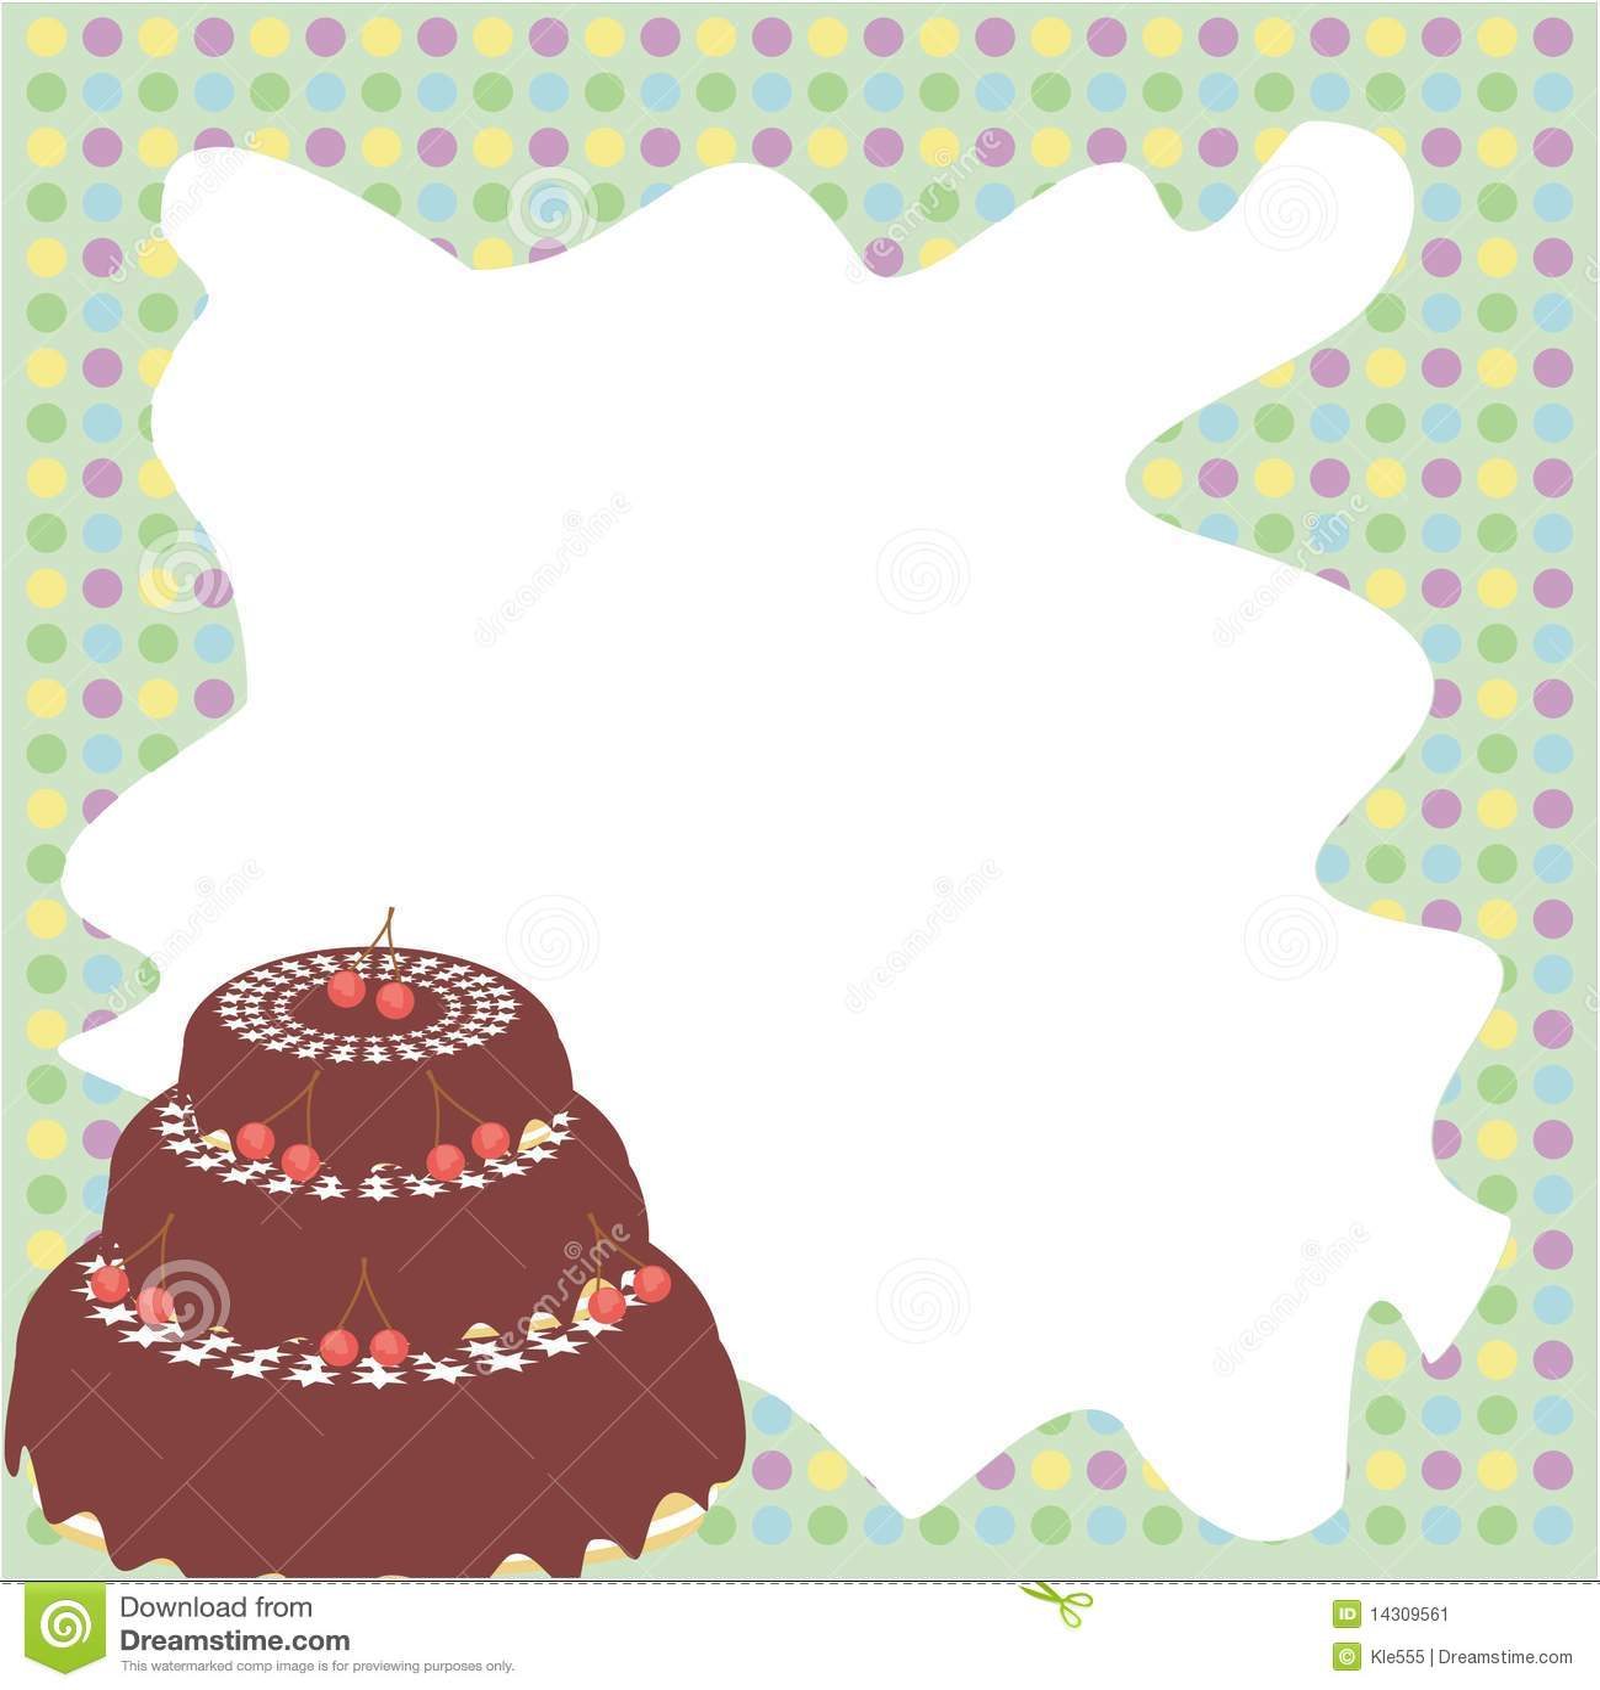 Cake With Photo Frame : Frame With Cake Stock Image - Image: 14309561